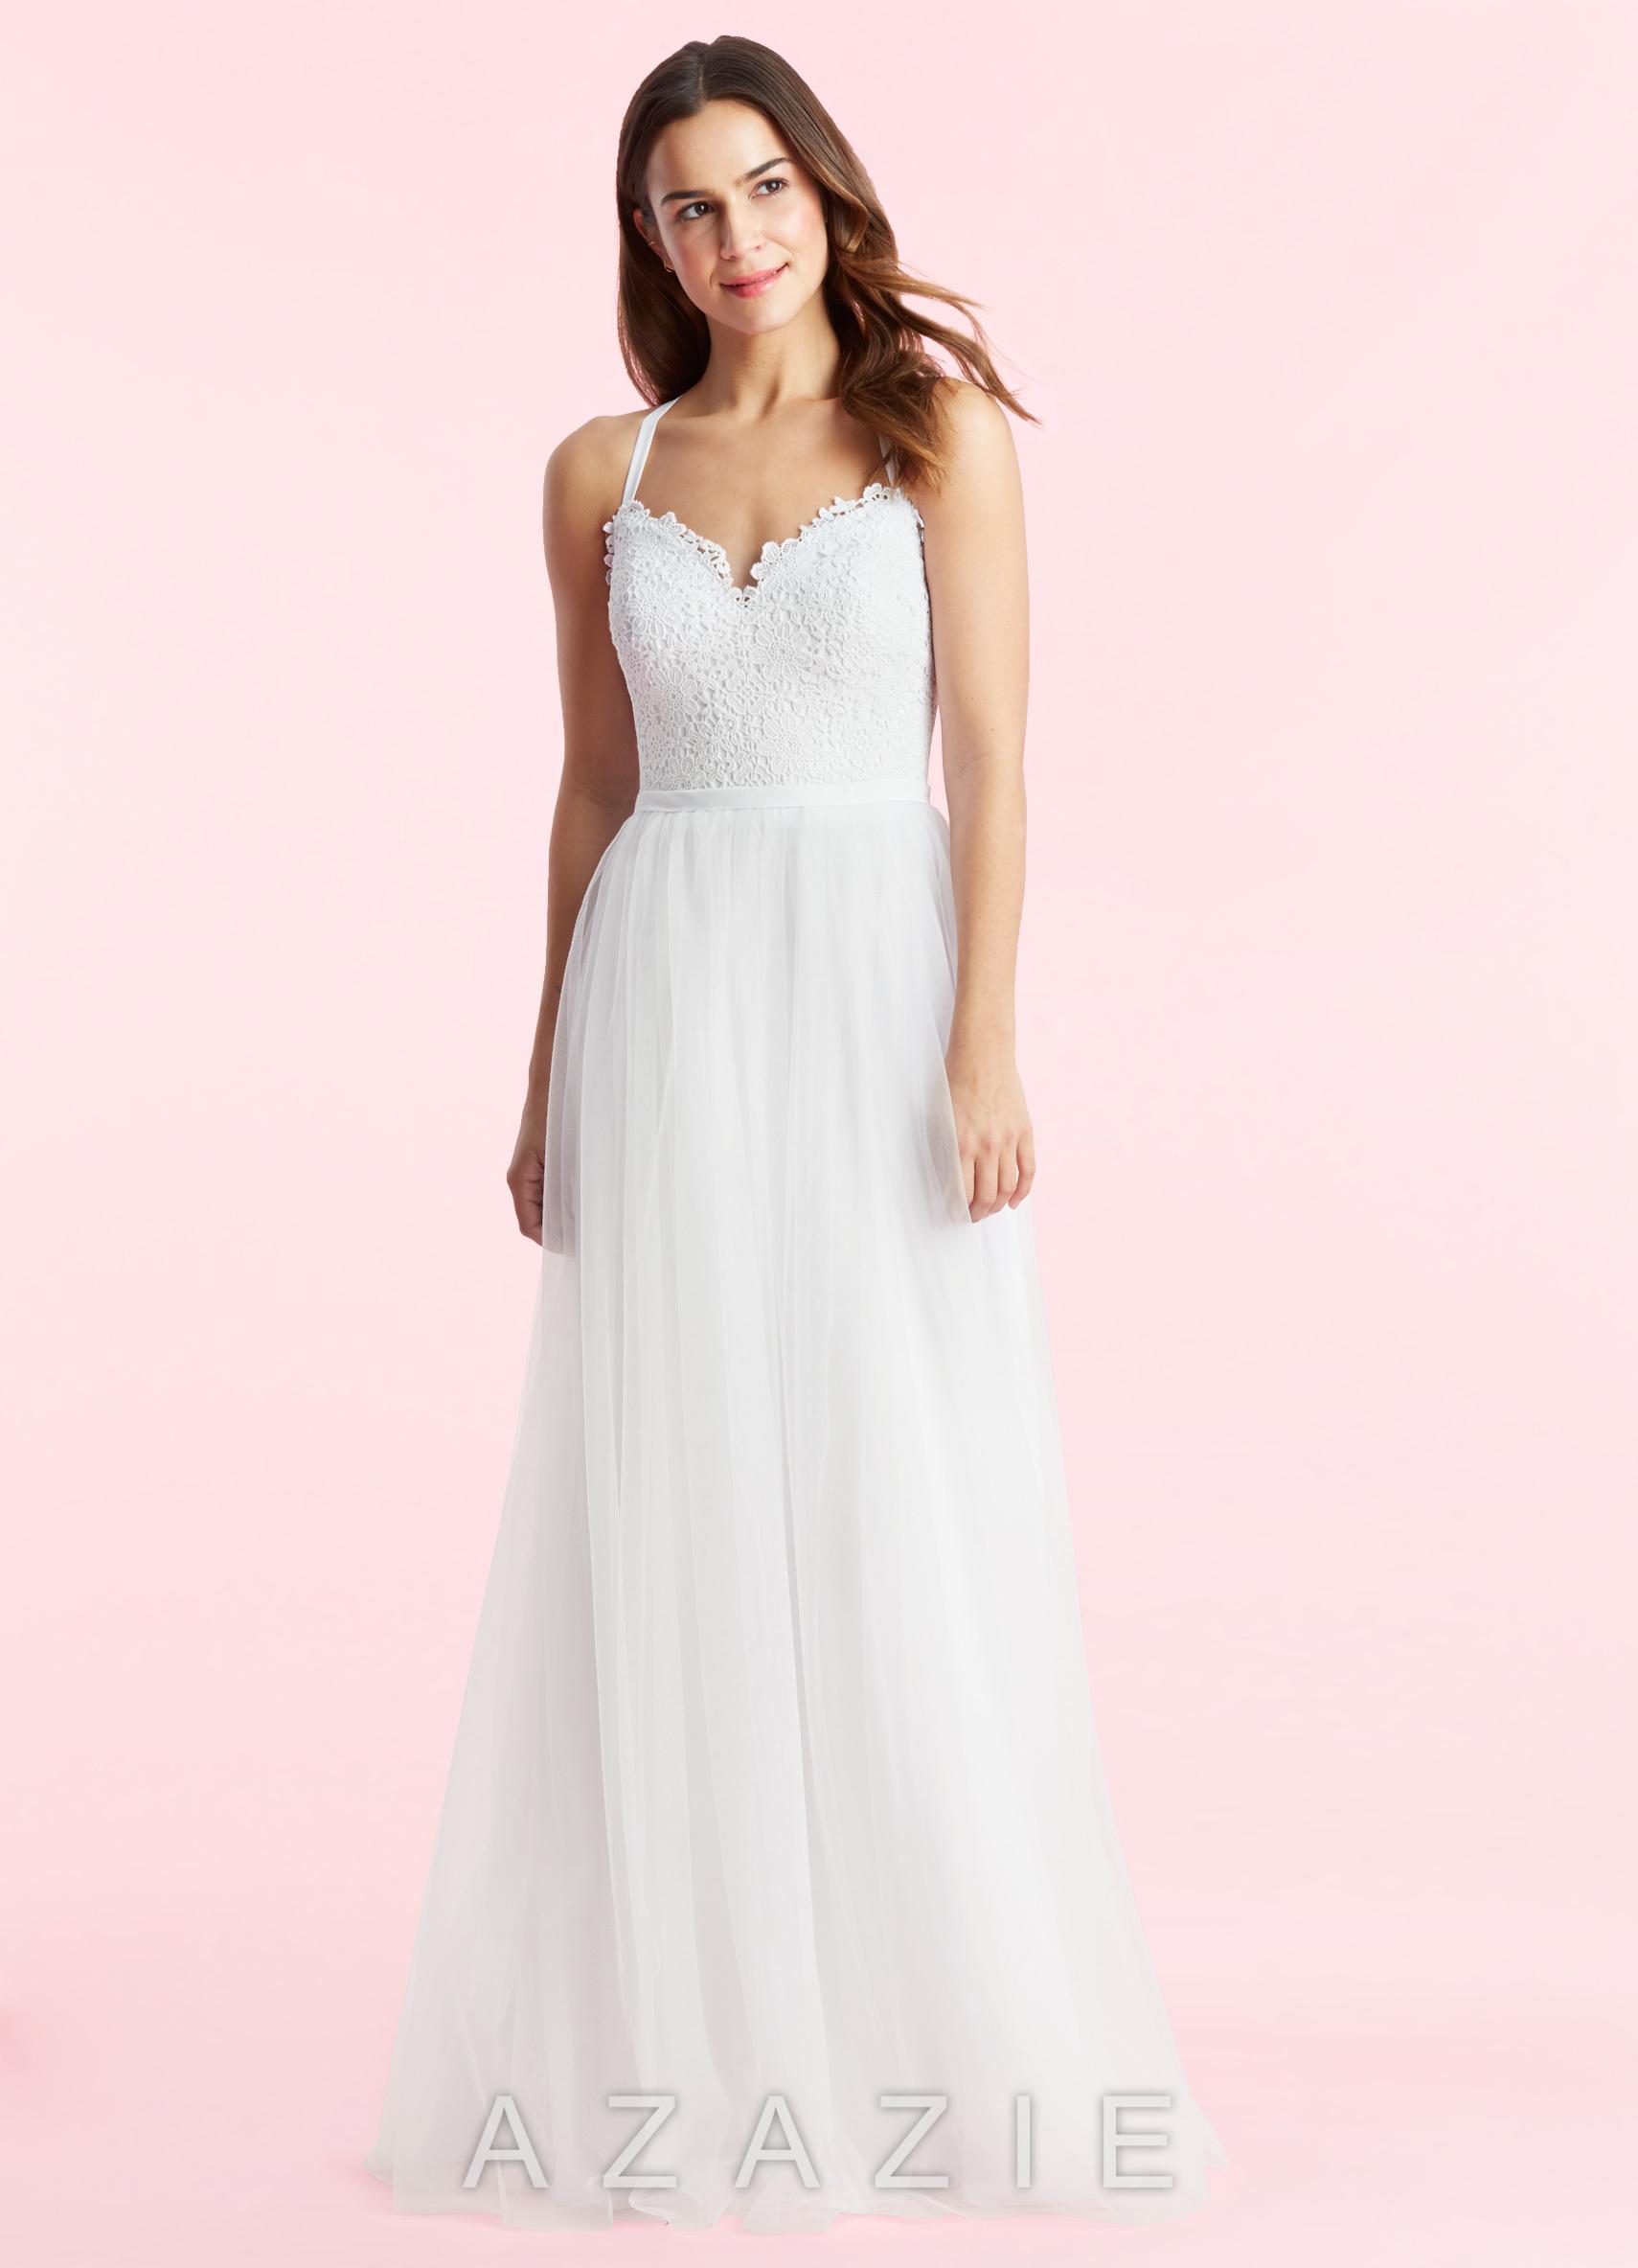 Wedding dresses bridal gowns wedding gowns azazie azazie addy bg junglespirit Image collections